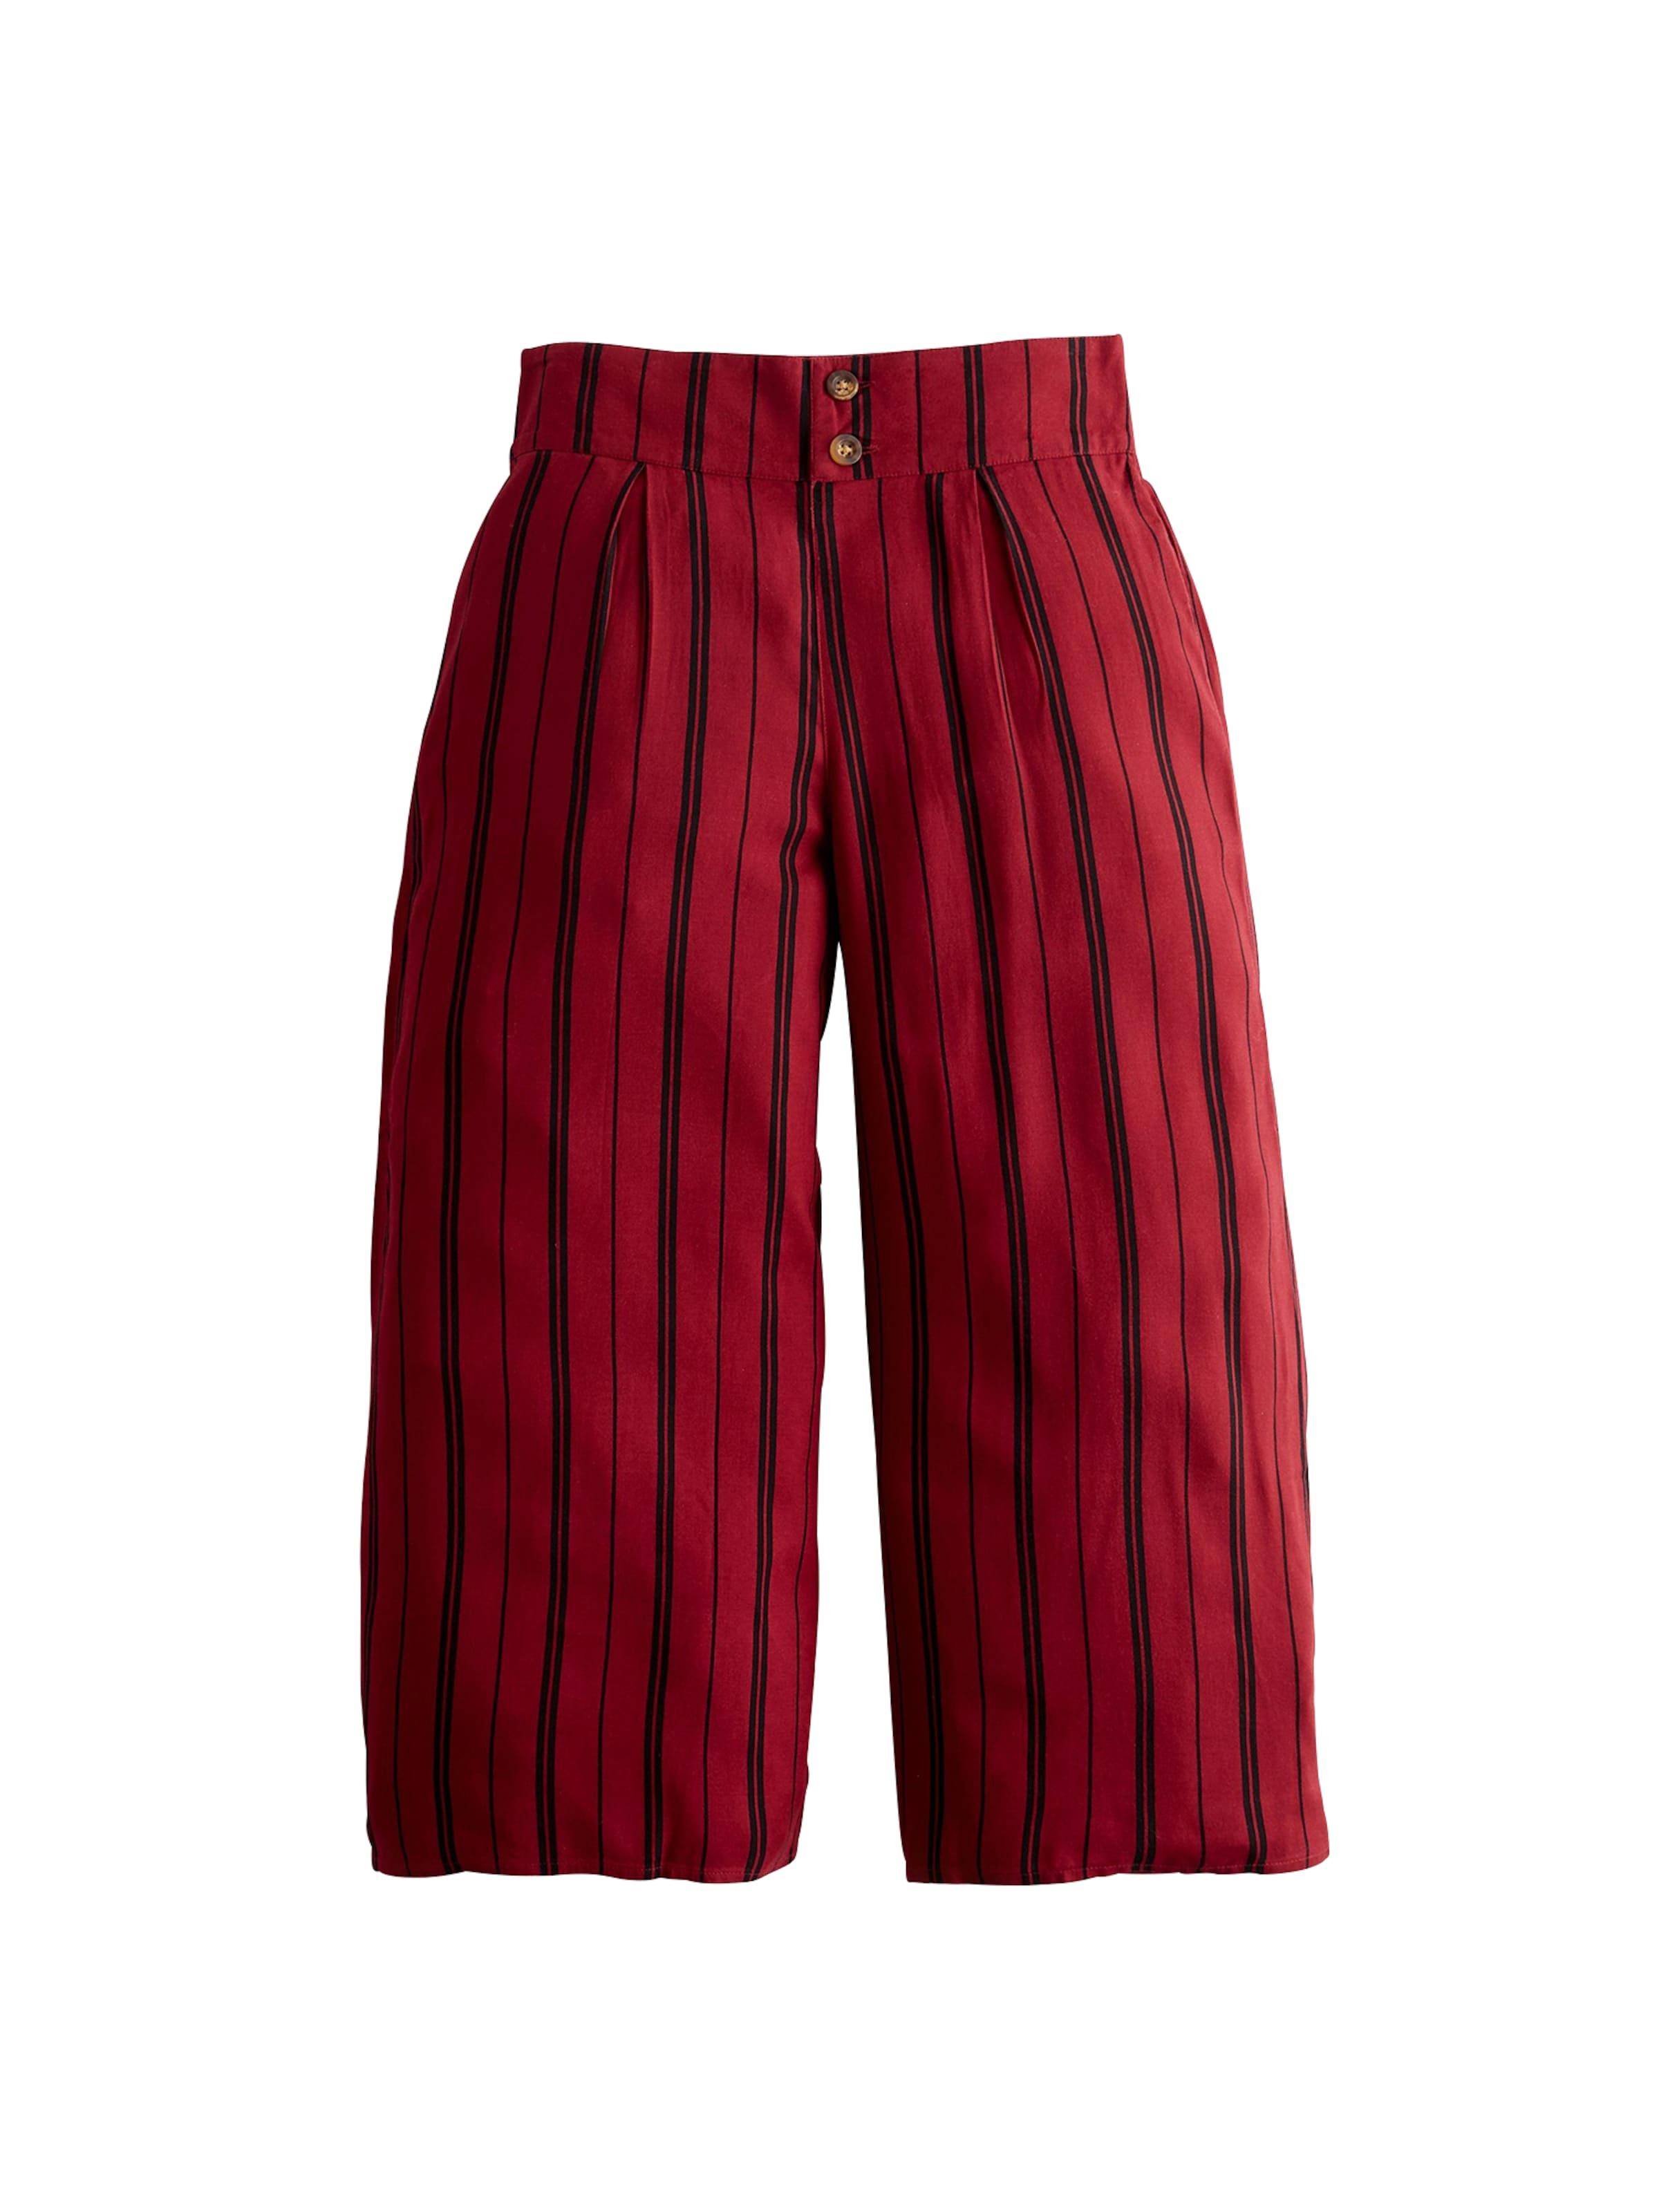 Pantalon spring' 'sb19 Hollister RougeNoir En TcF5l3u1JK